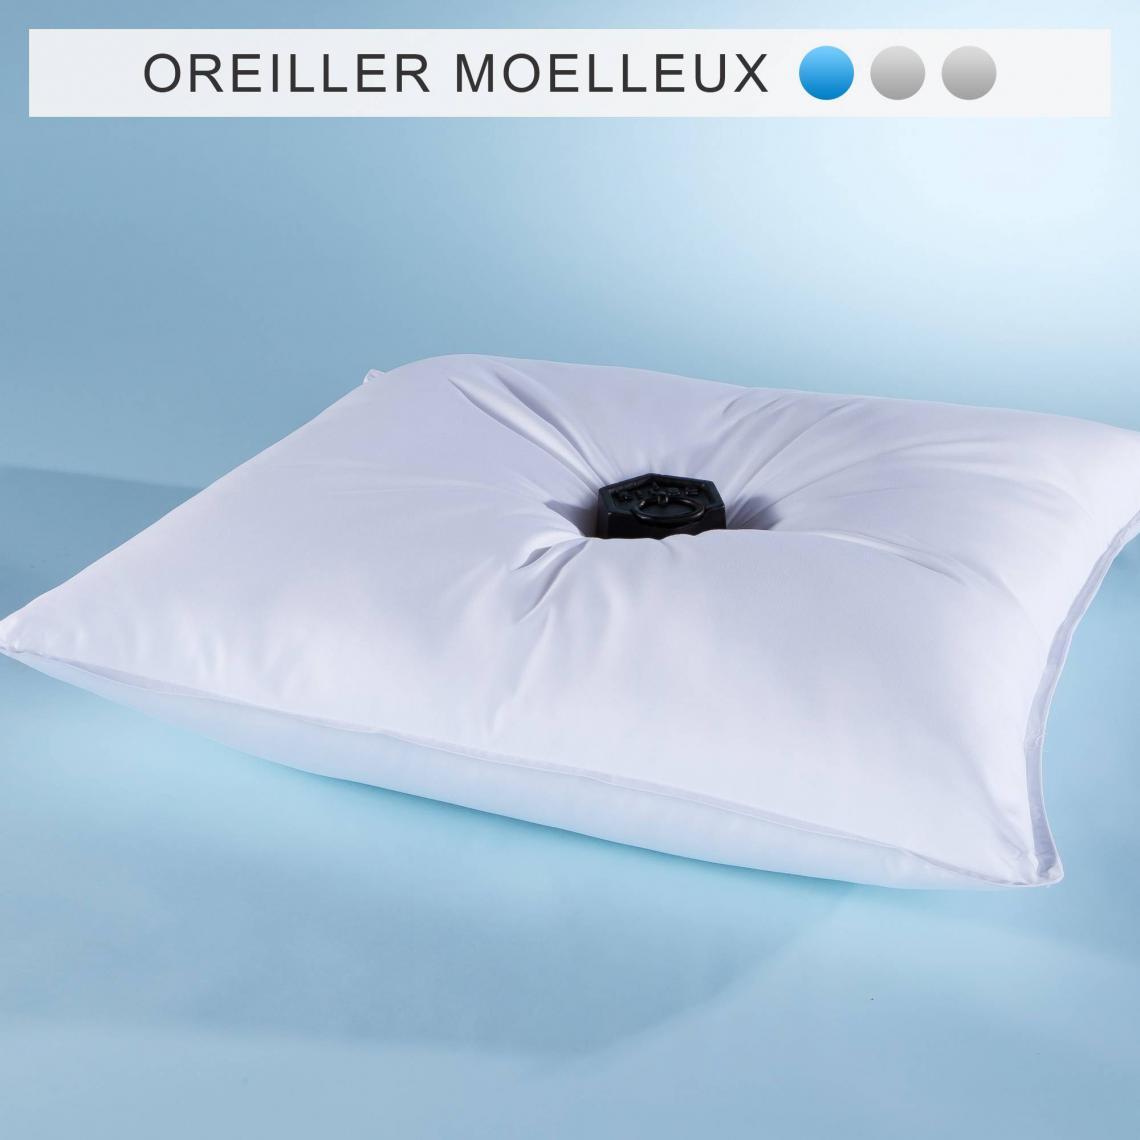 Oreiller Synthetique Microfibre Selenia Confort Moelleux Blanc